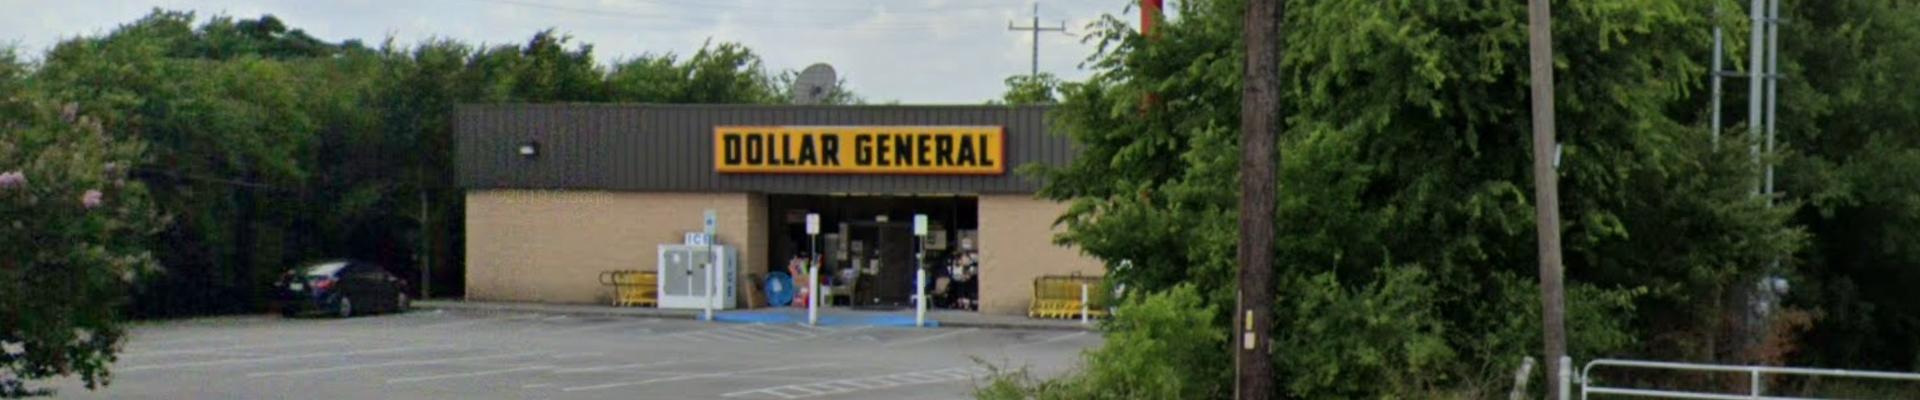 Dollar General (7432) - Converse, Texas